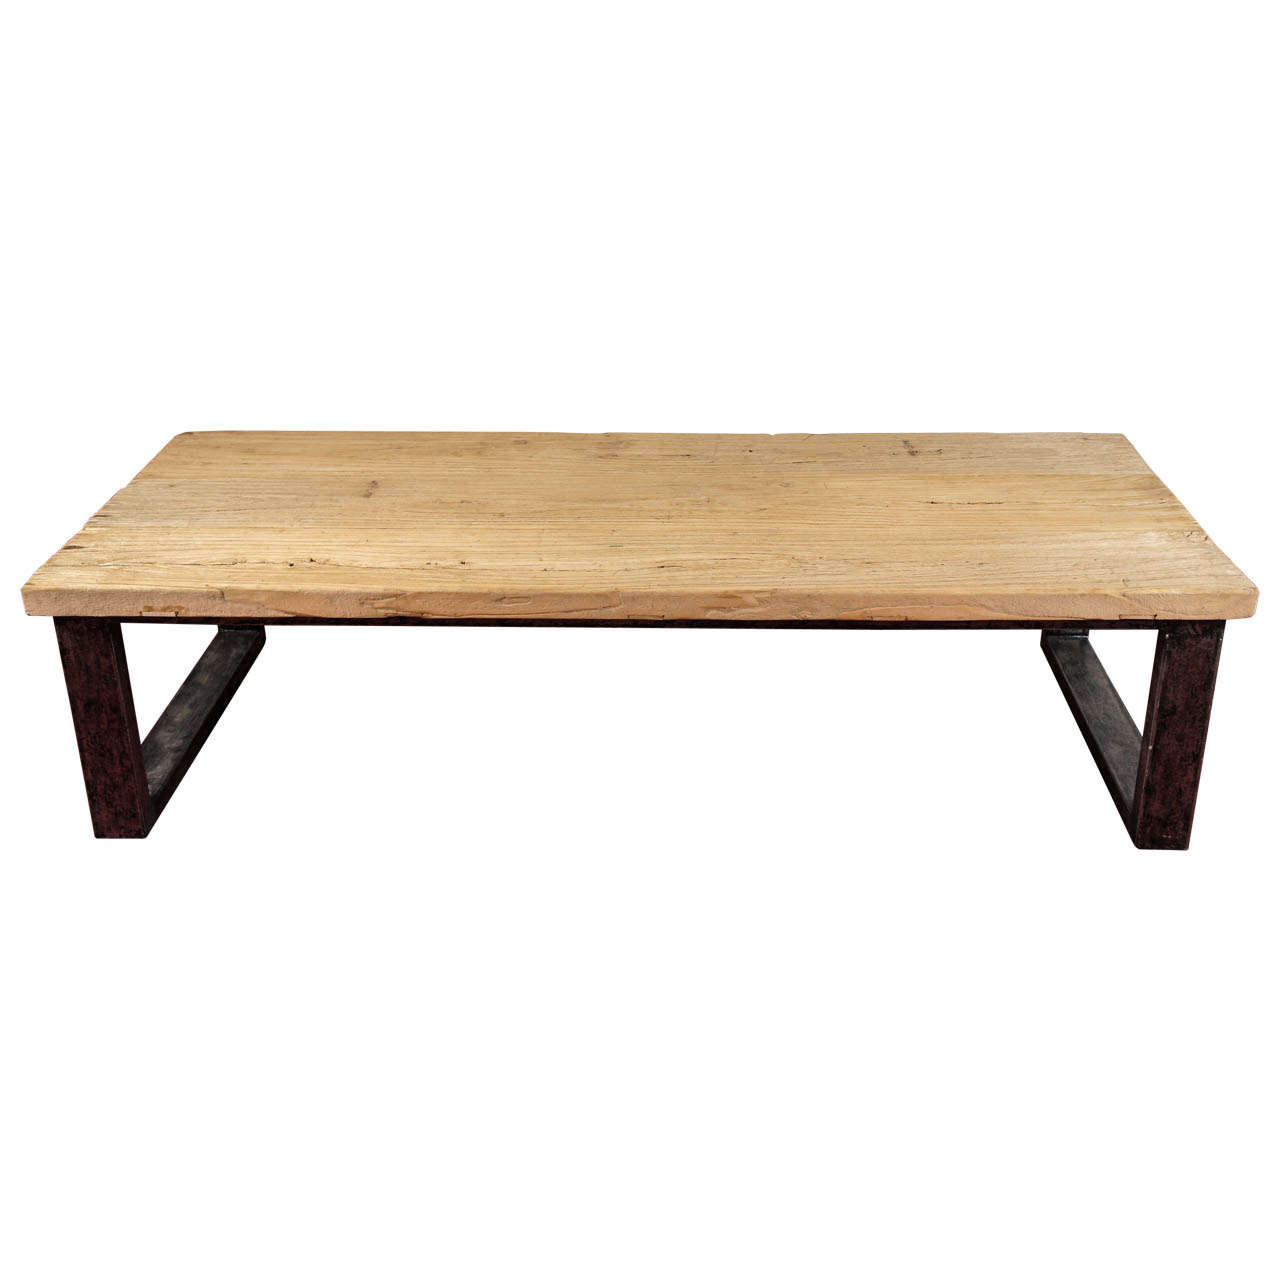 Industrial Style Teak Wood Coffee Table At 1stdibs